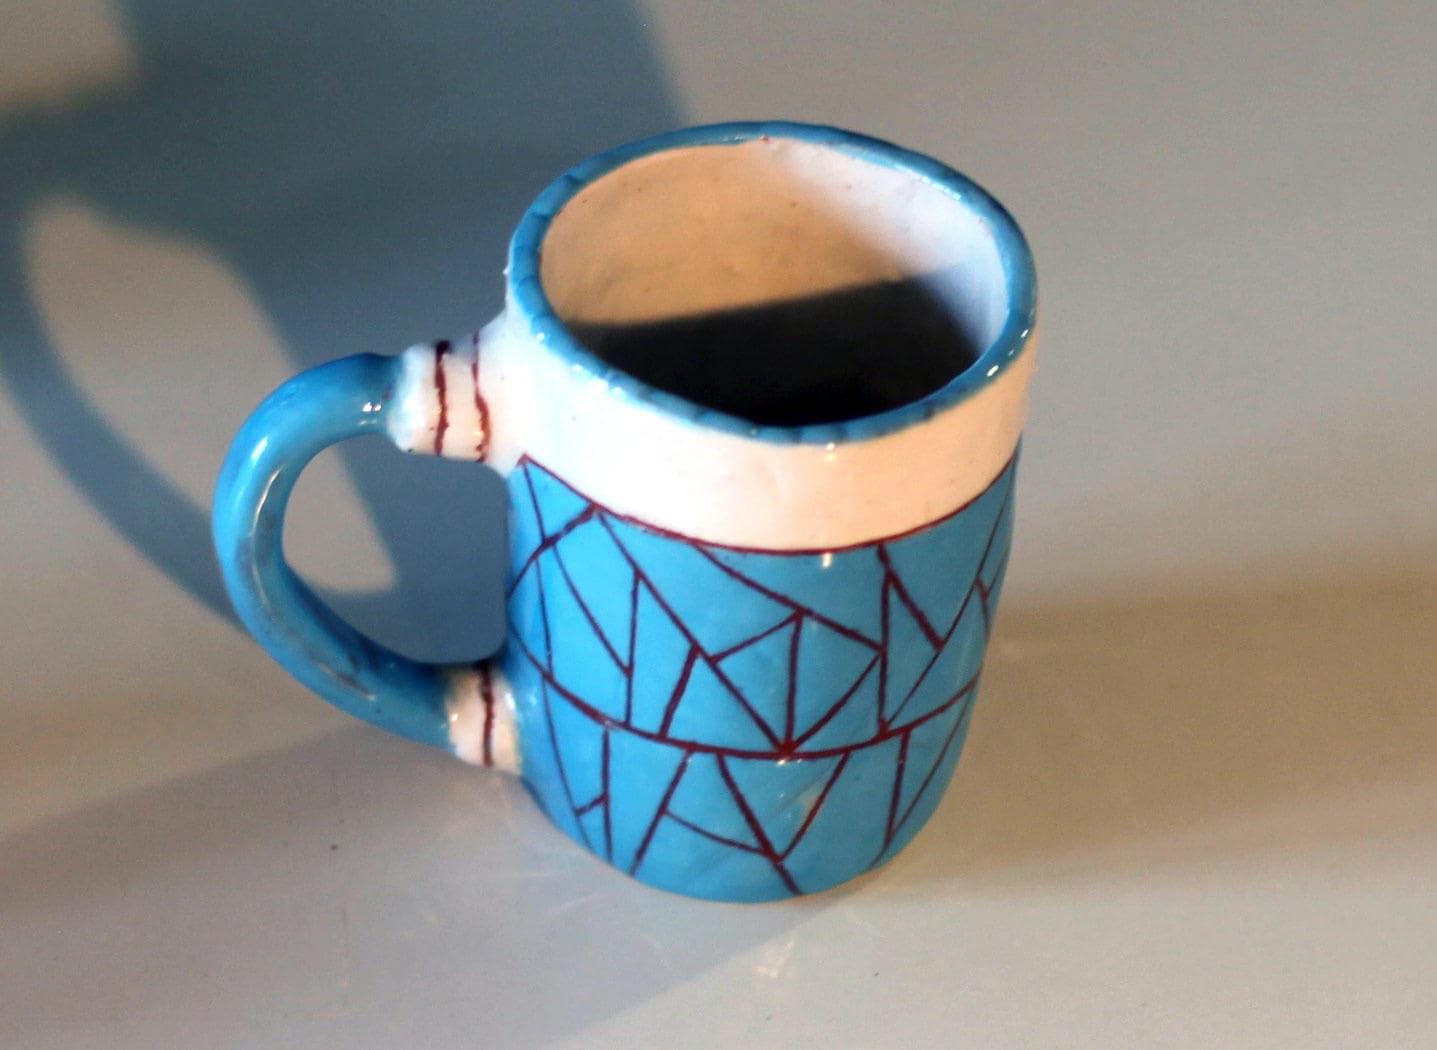 tasse mug artisanal vaisselle originale tasse c ramique. Black Bedroom Furniture Sets. Home Design Ideas